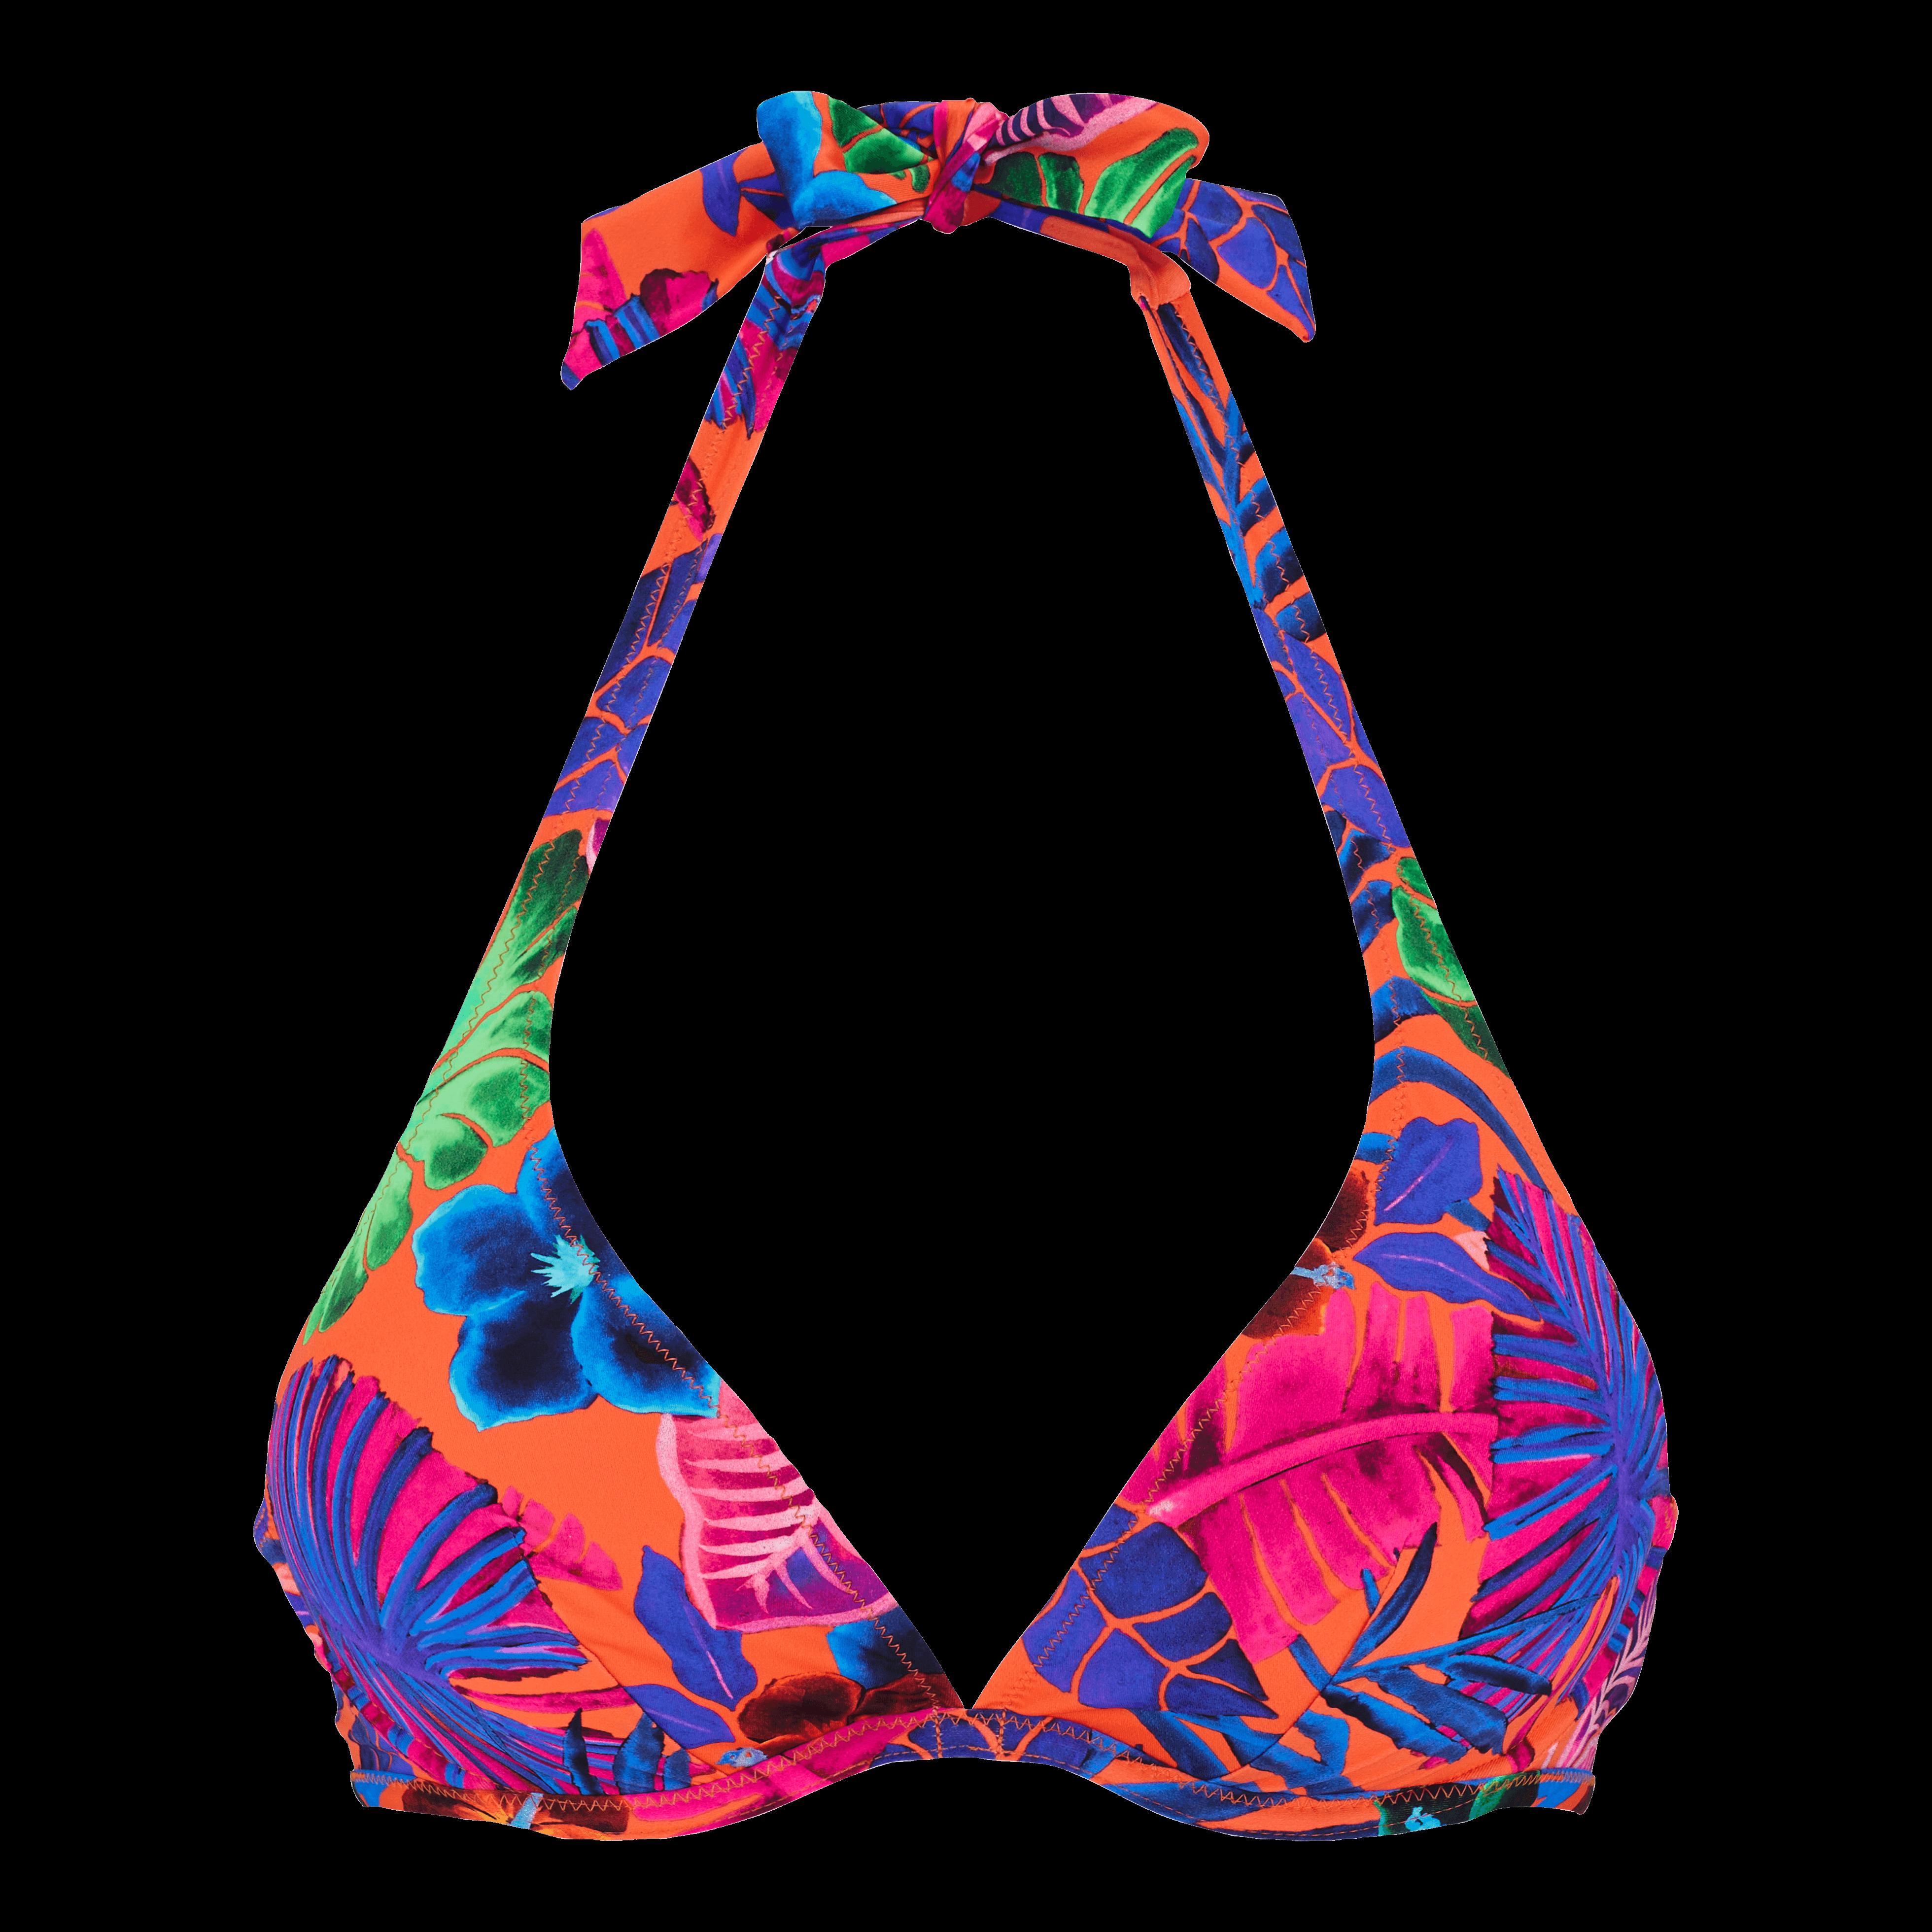 Women Swimwear - Women Bikini Top With Underwires Porto Rico - Swimming Trunk - Faith in Orange